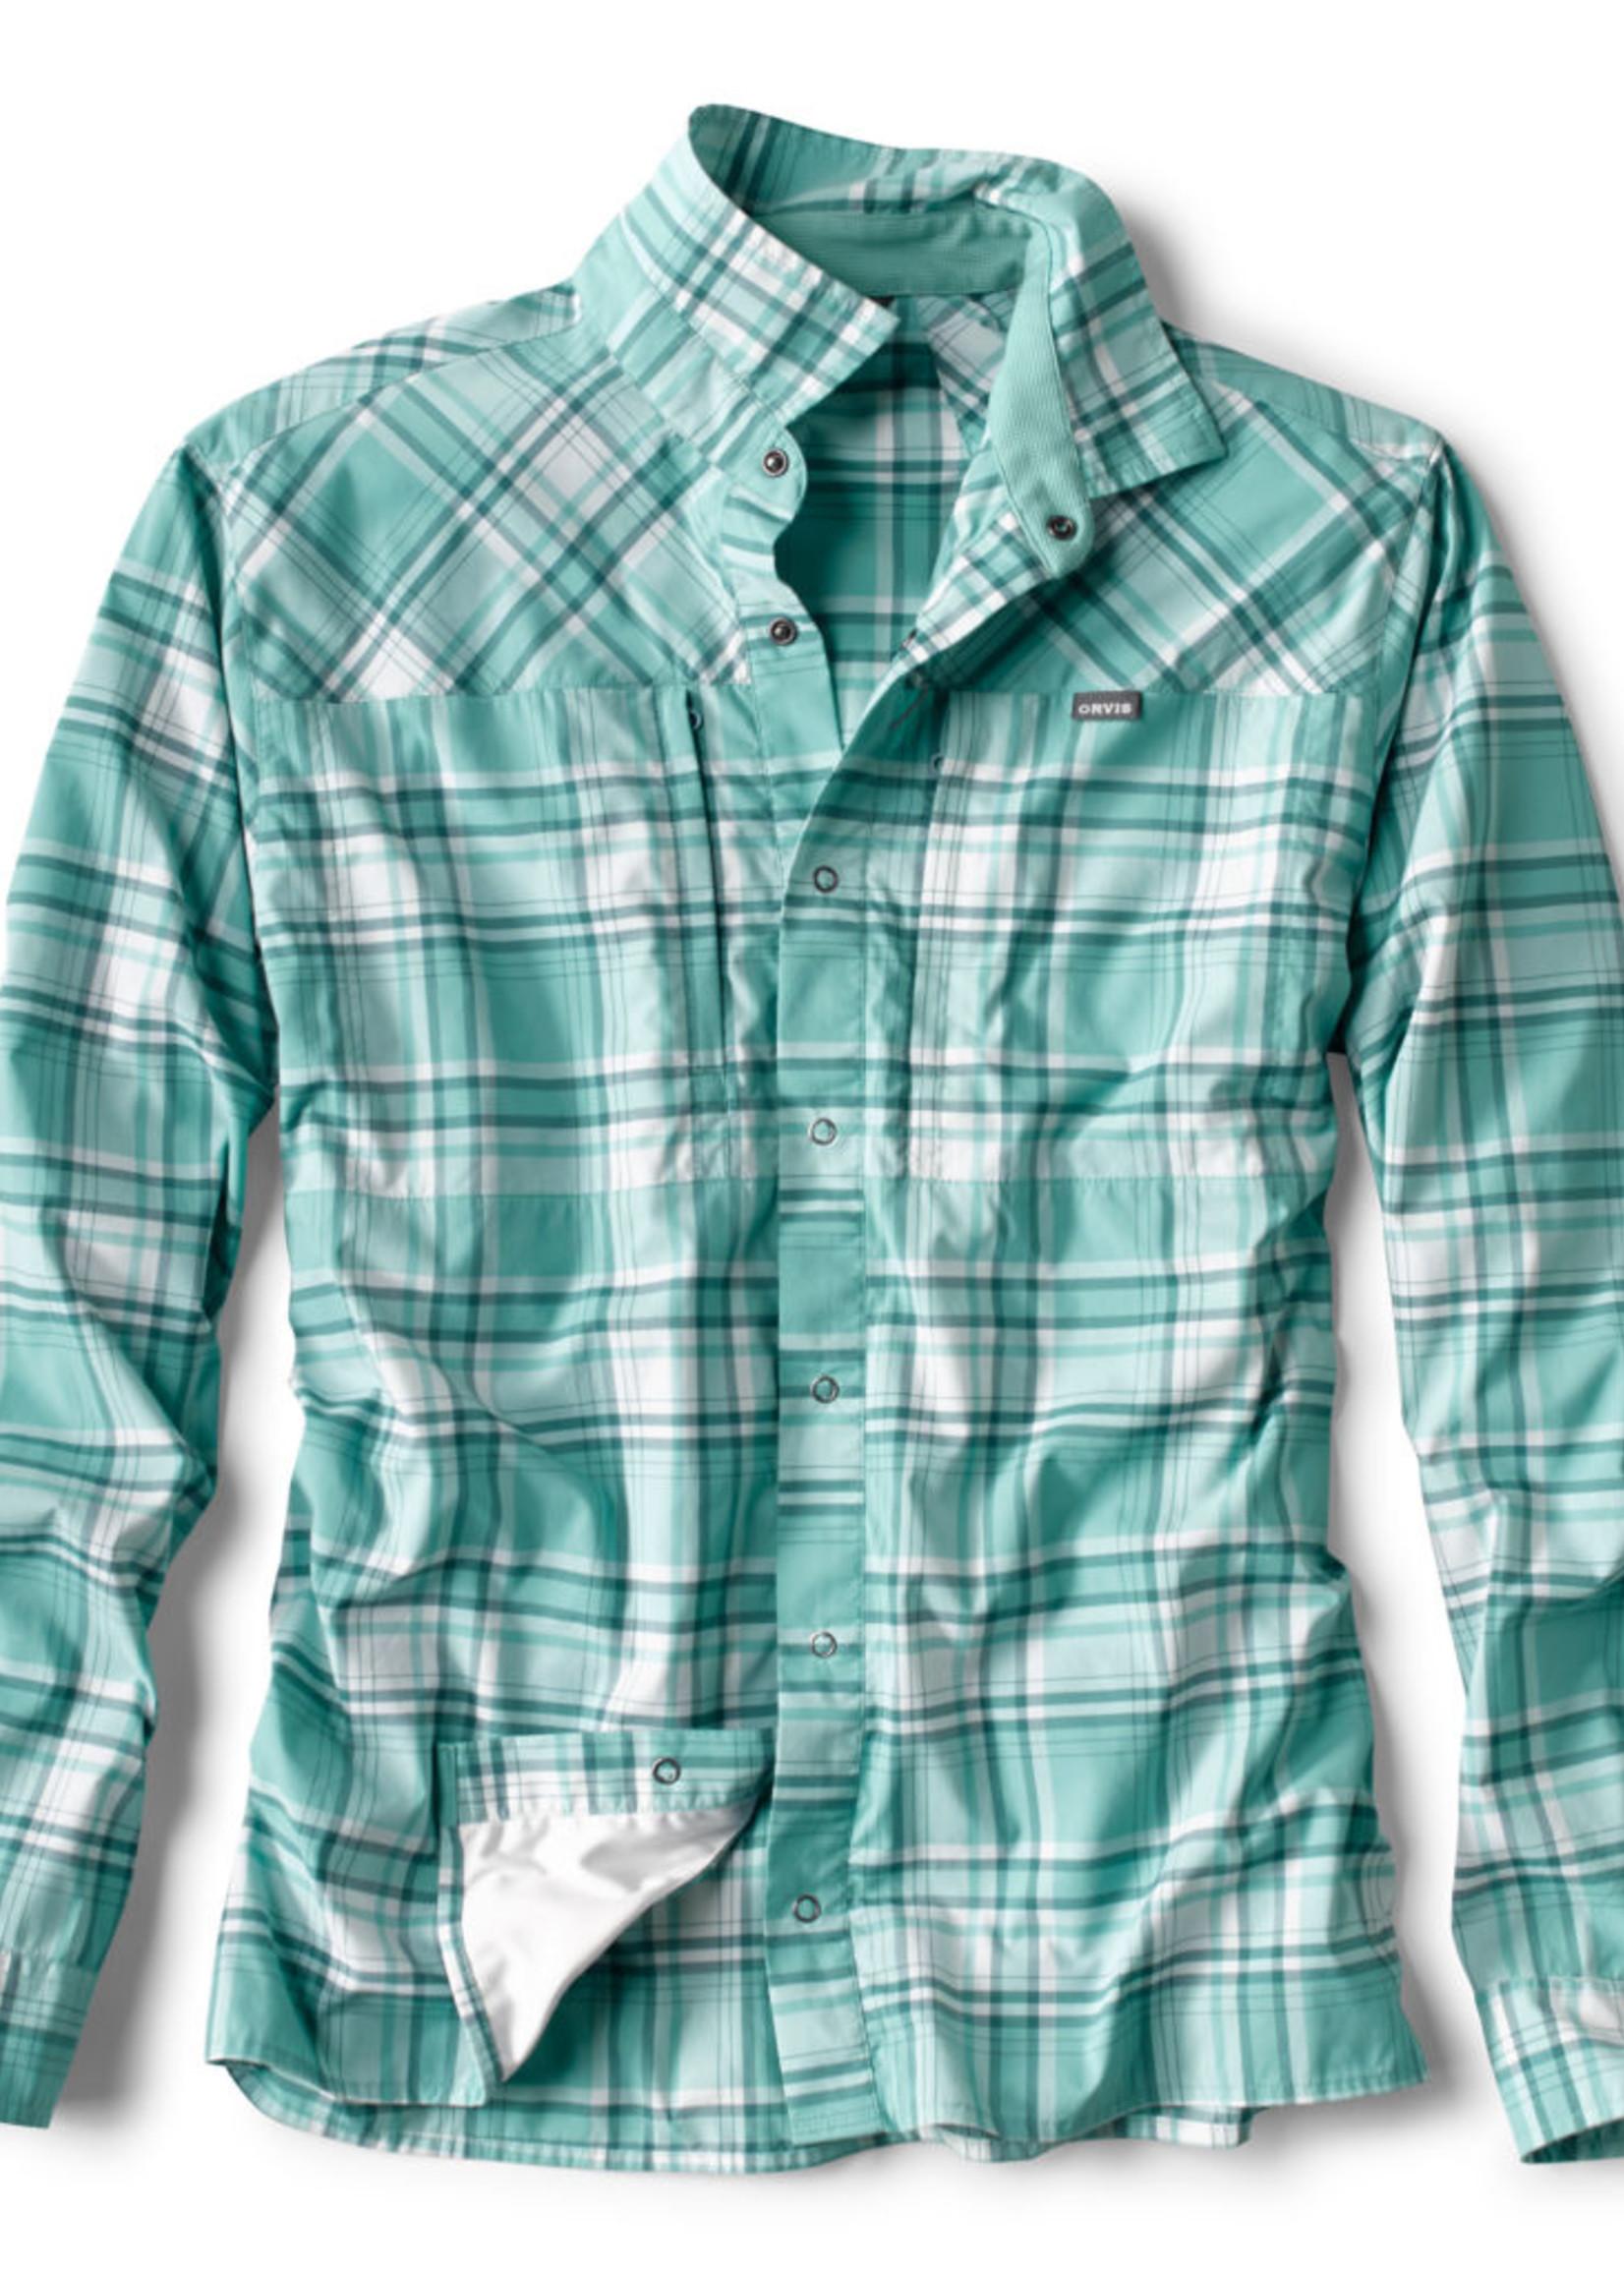 ORVIS Men's Pro Stretch Shirt